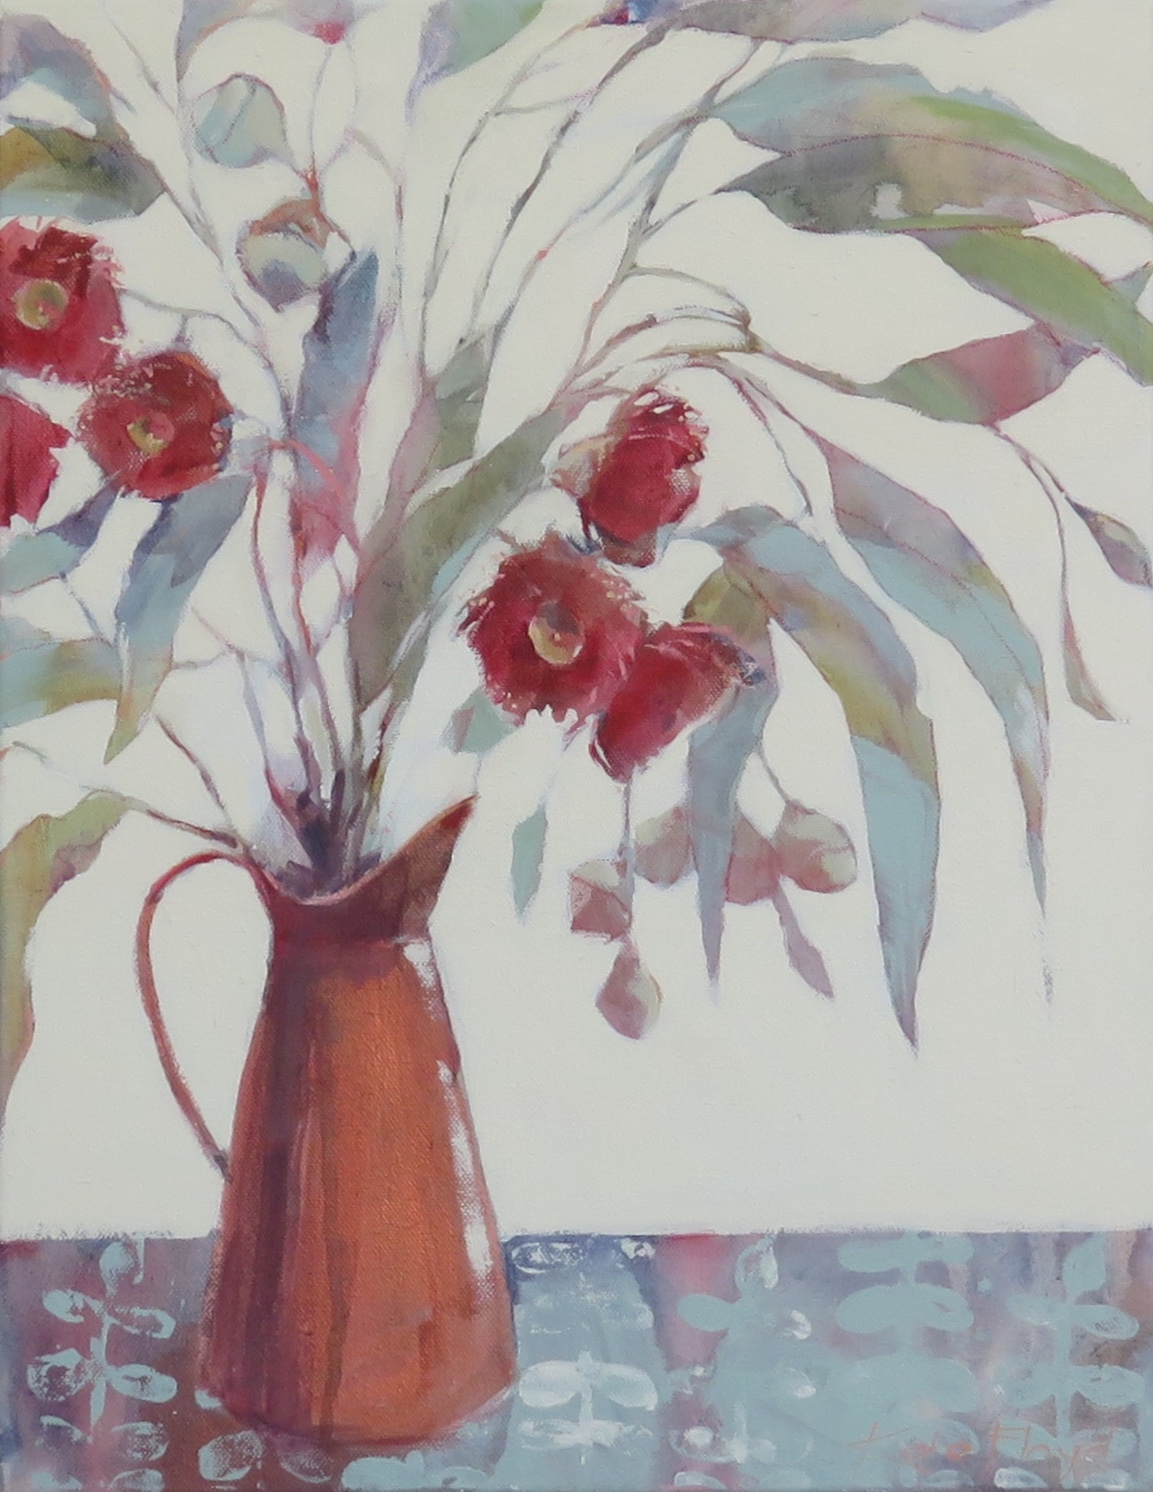 Silver Princess 2018 Acrylic on canvas 3